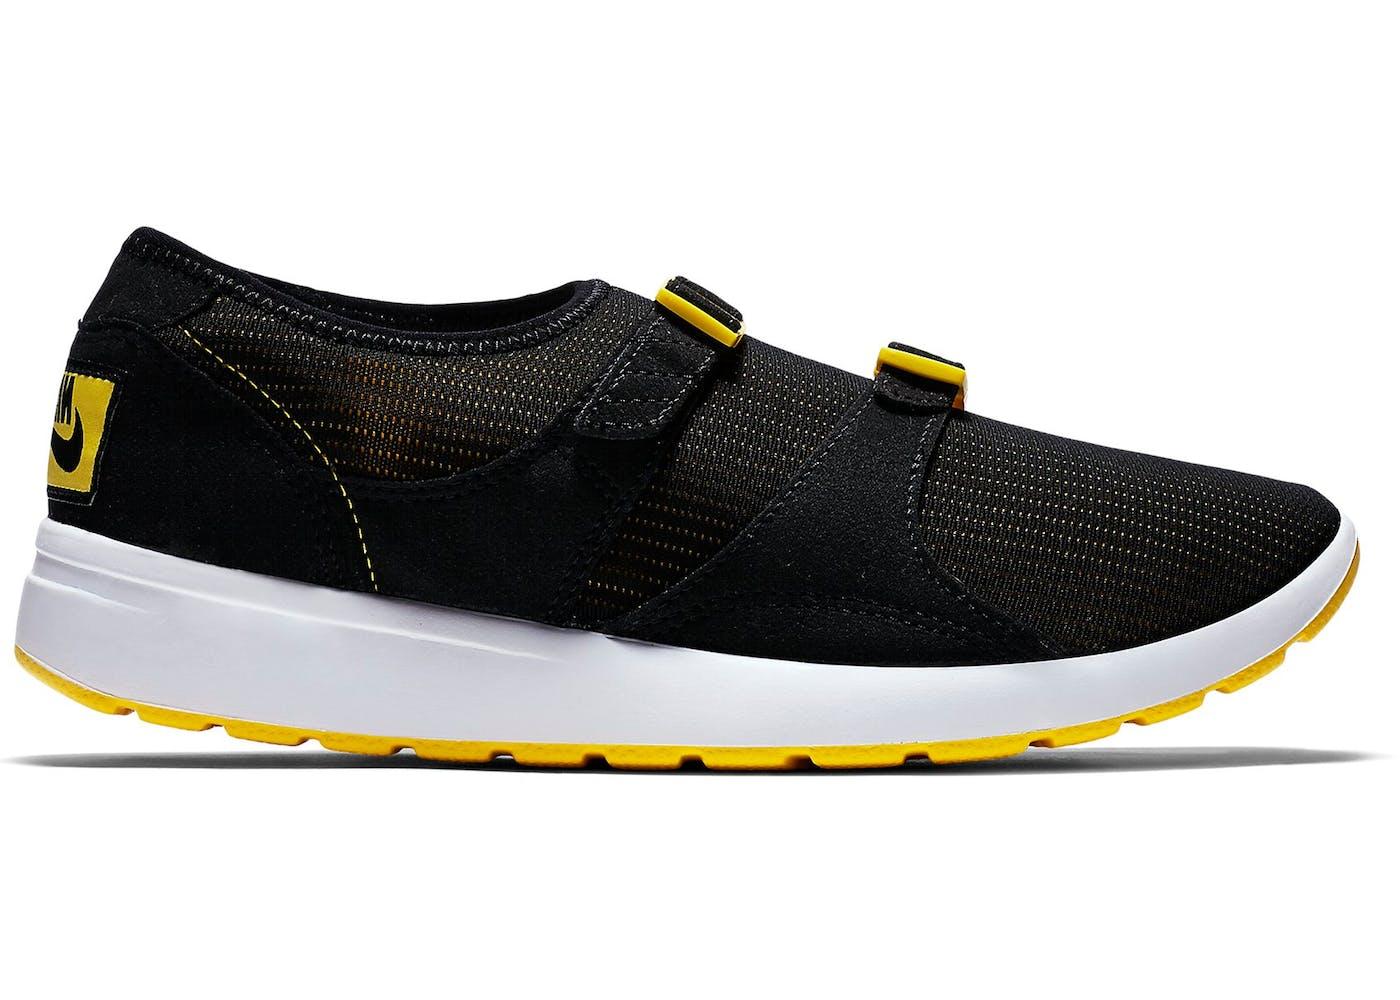 watch d1363 e0b0f Sneakers - Buy & Sell